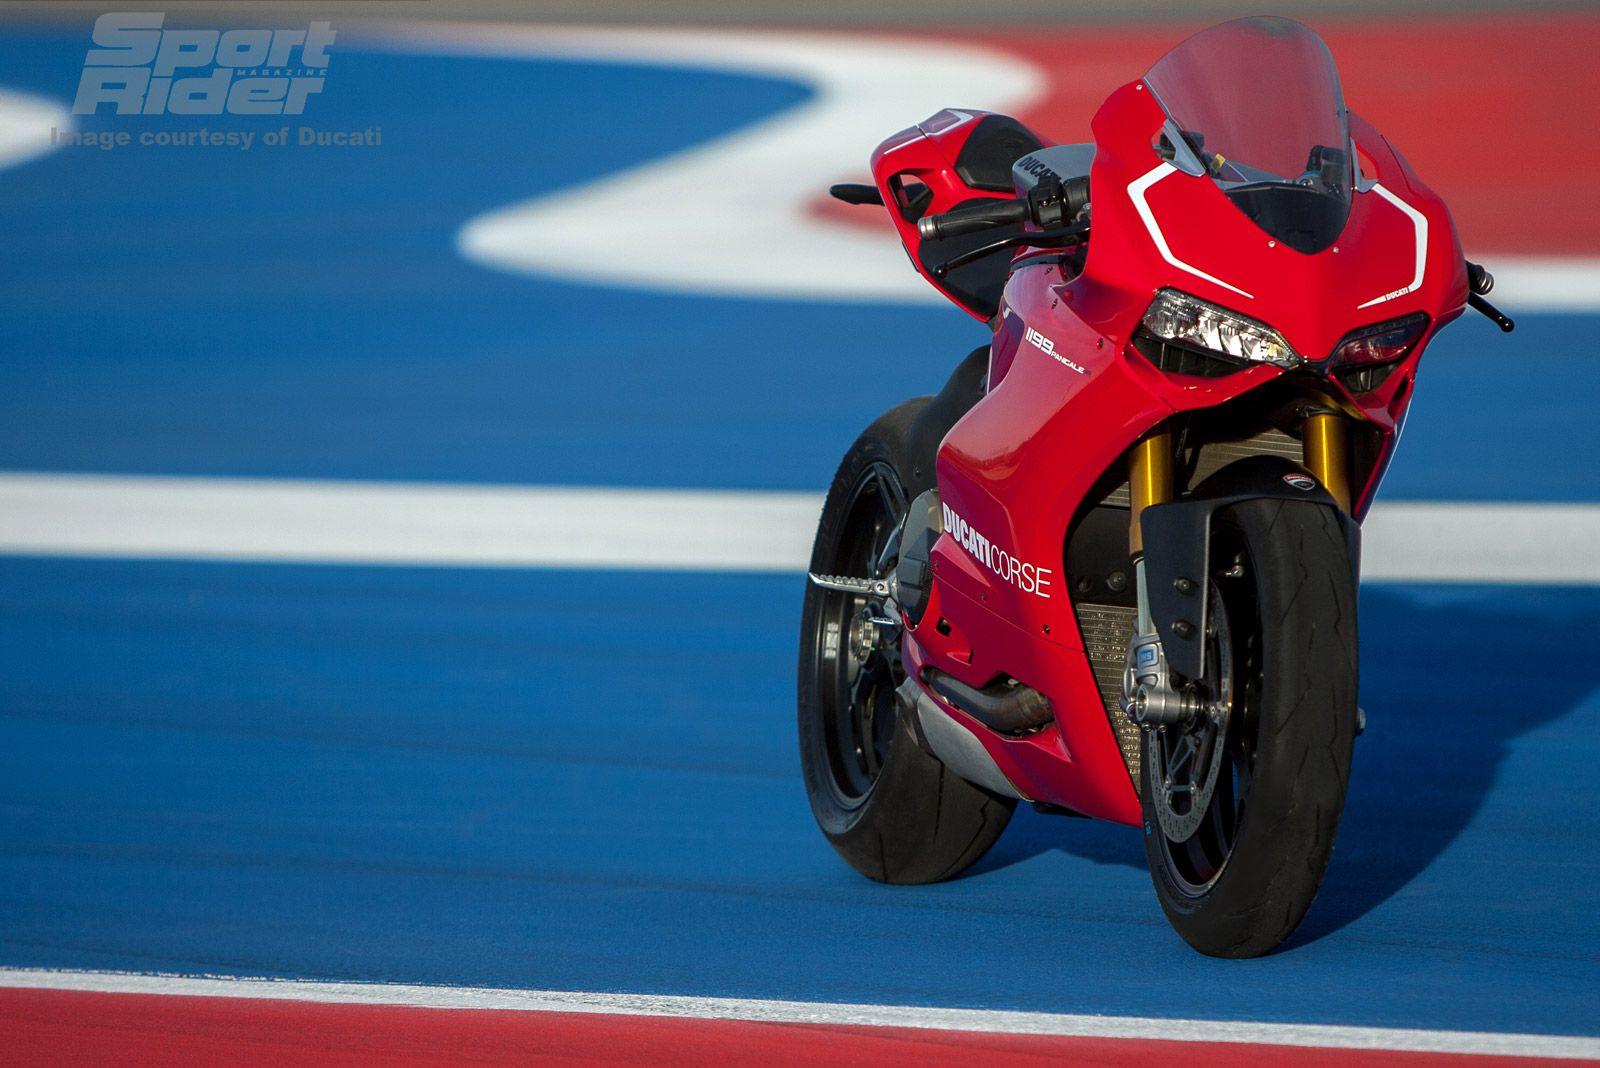 Ducati 1199 Panigale R wallpaper 181444 1600x1068